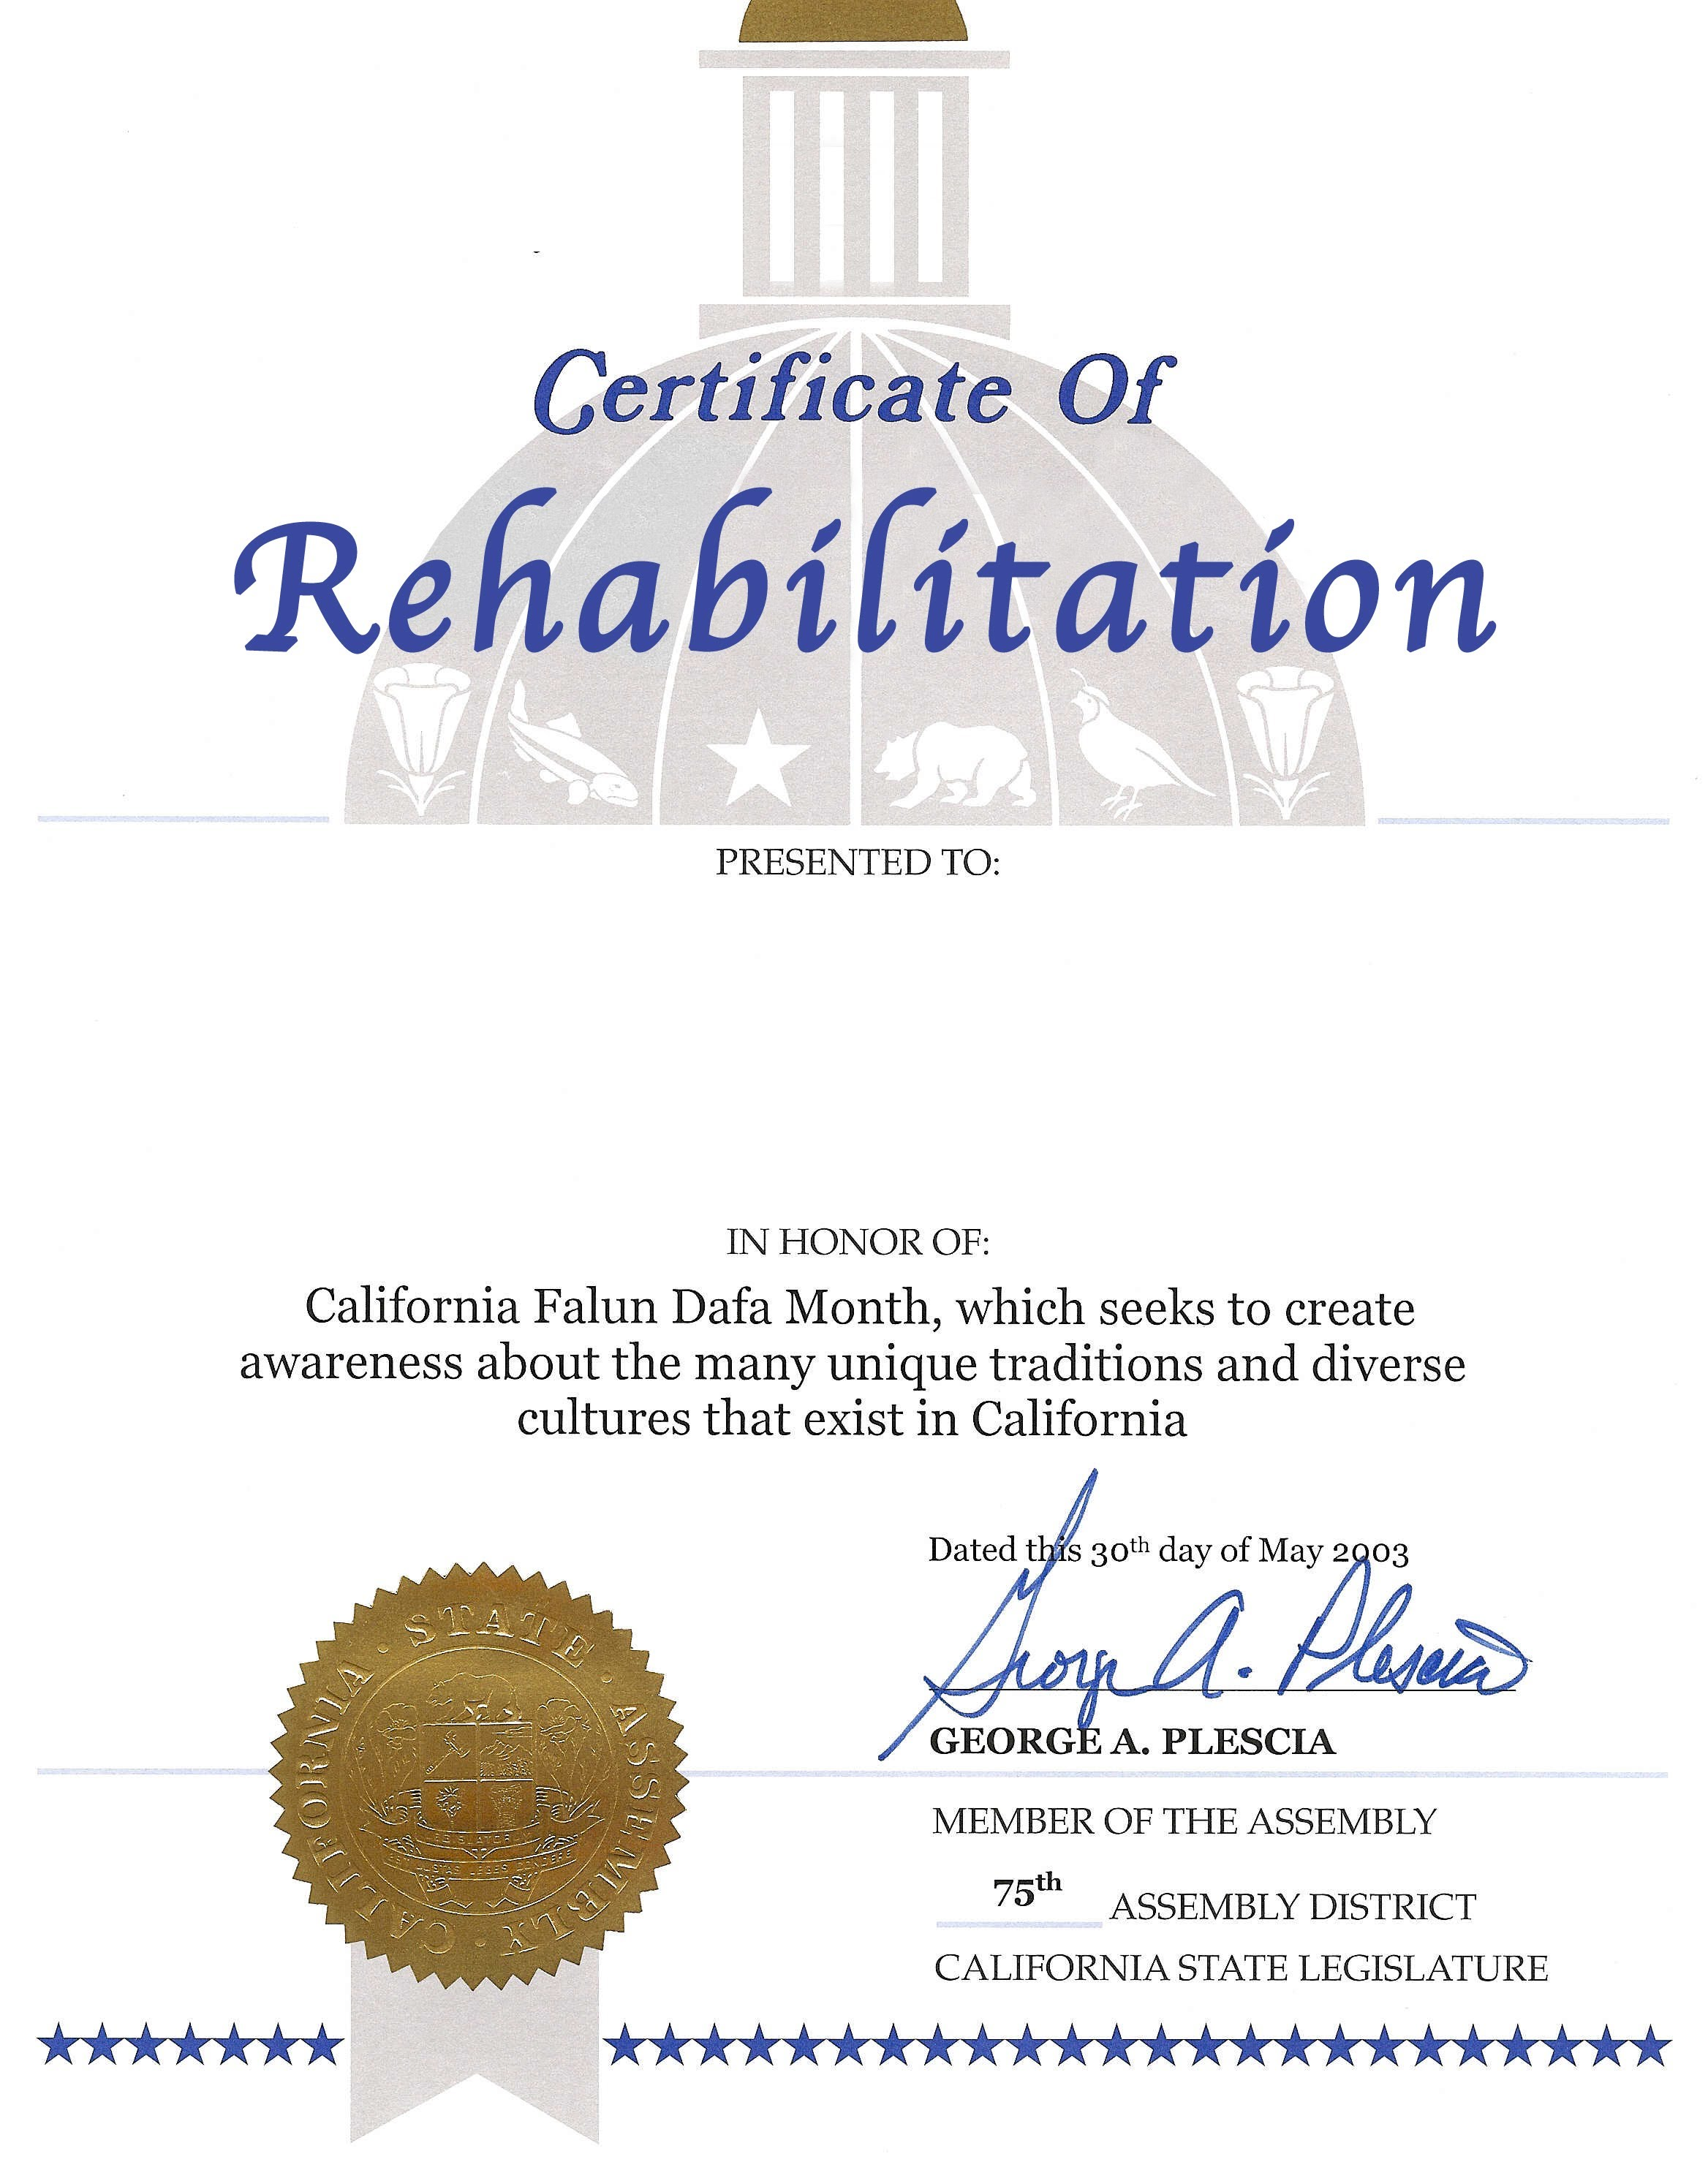 Certification of rehabilitation